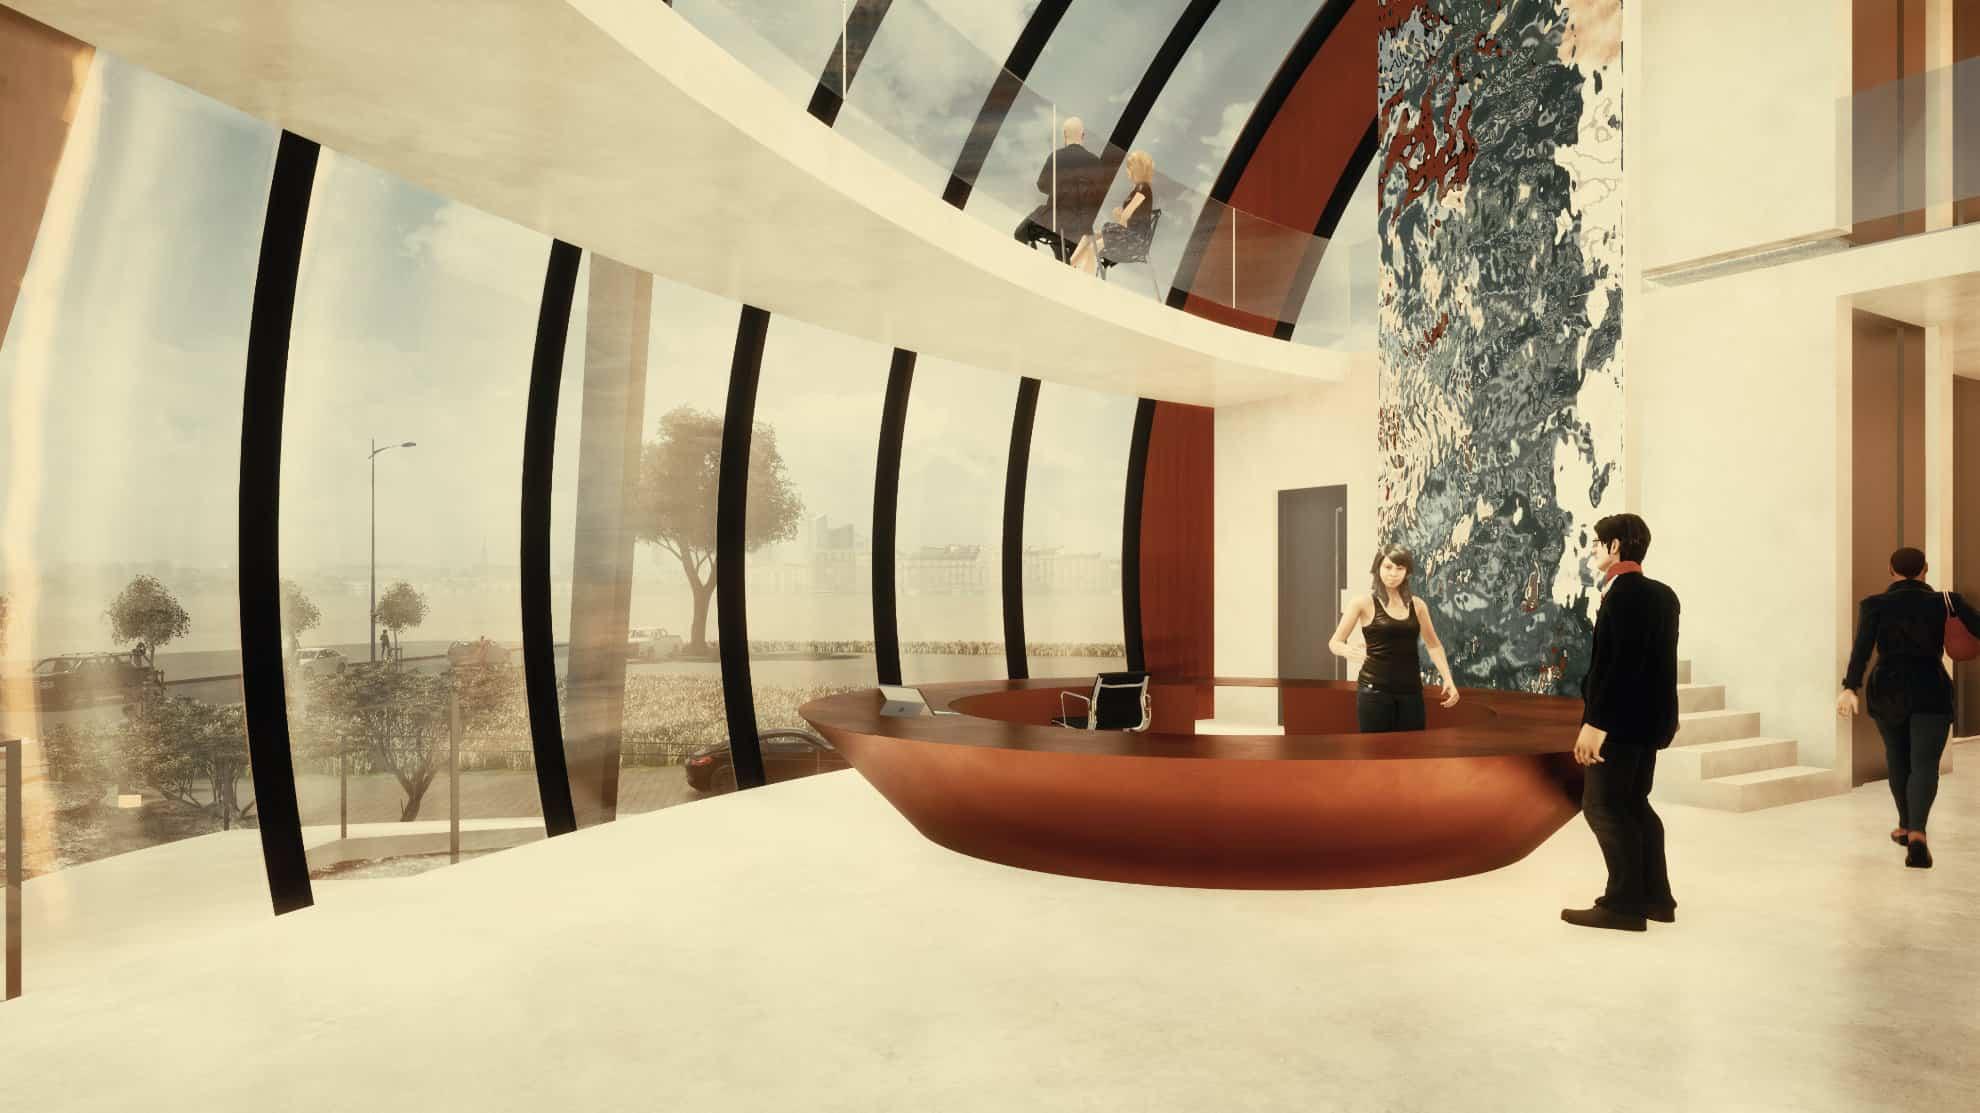 Fimengebäude Foyer Glas